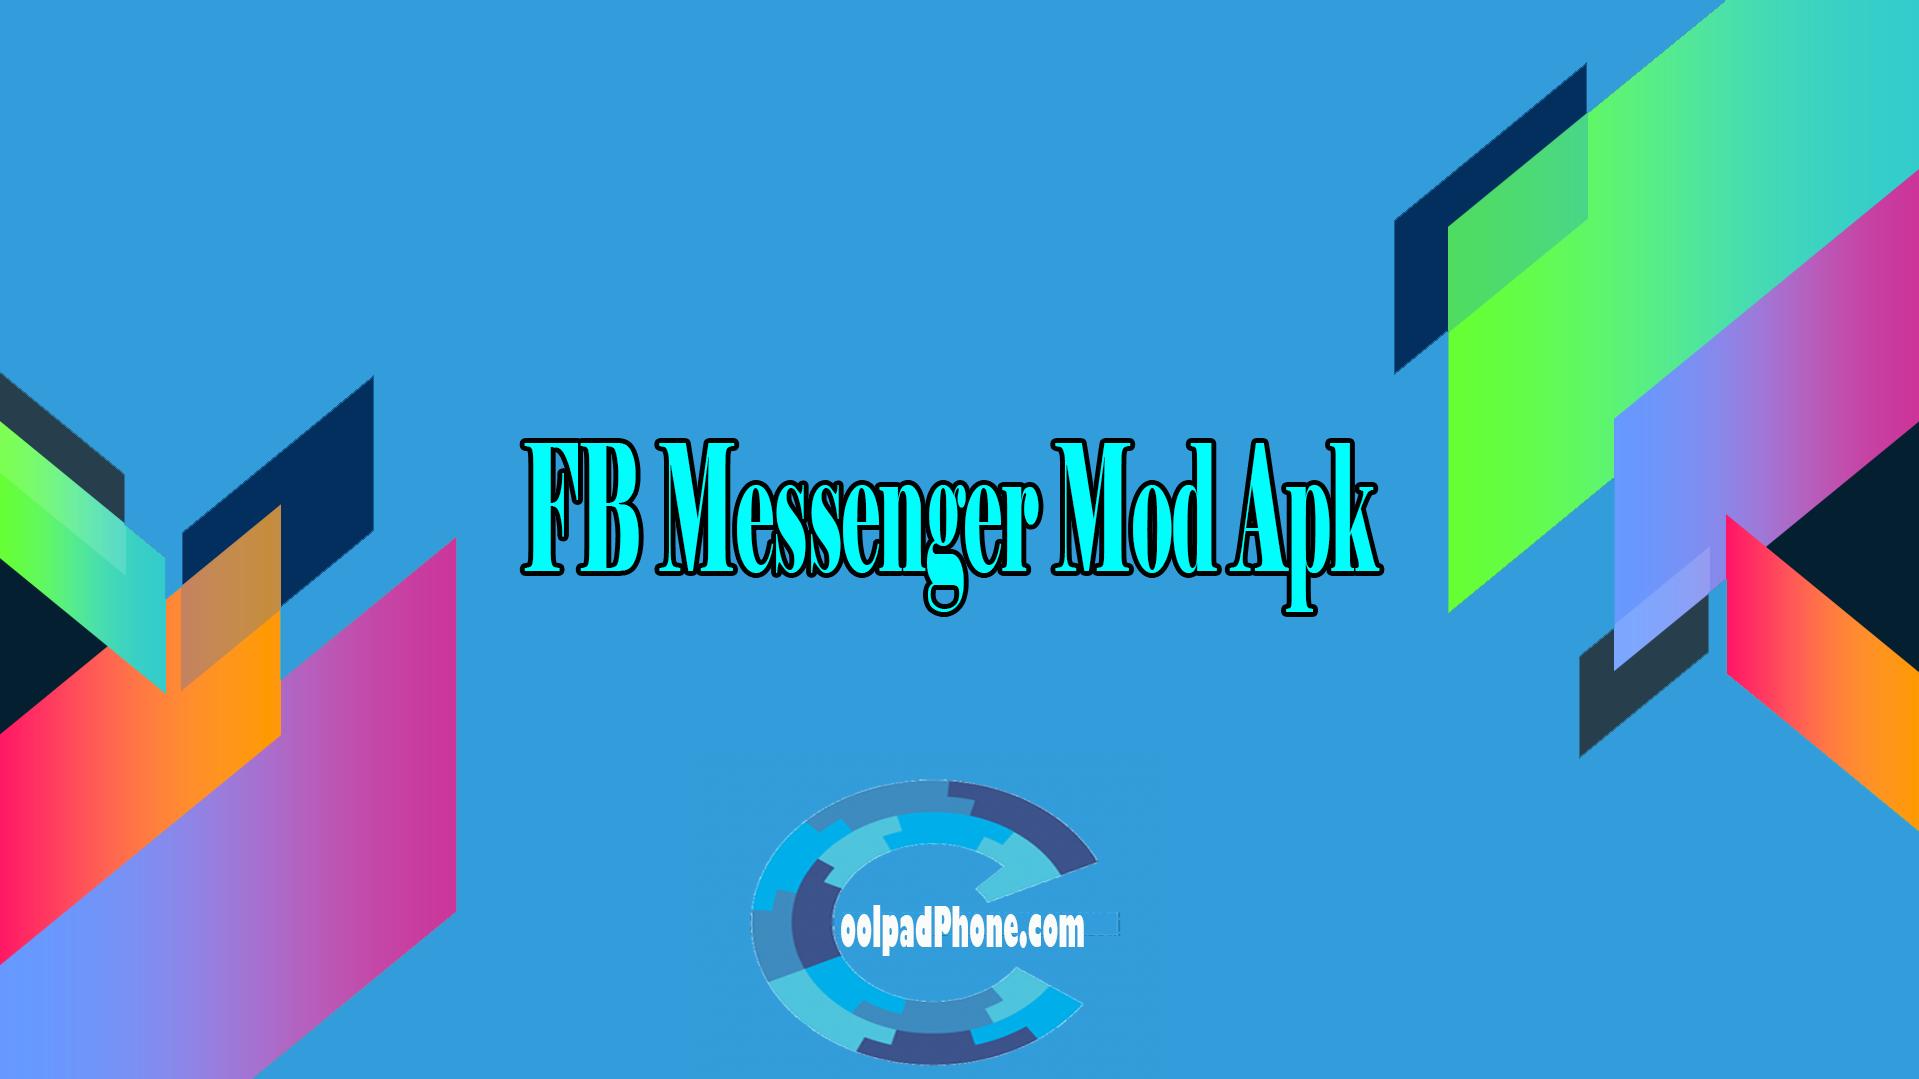 FB Messenger Mod Apk